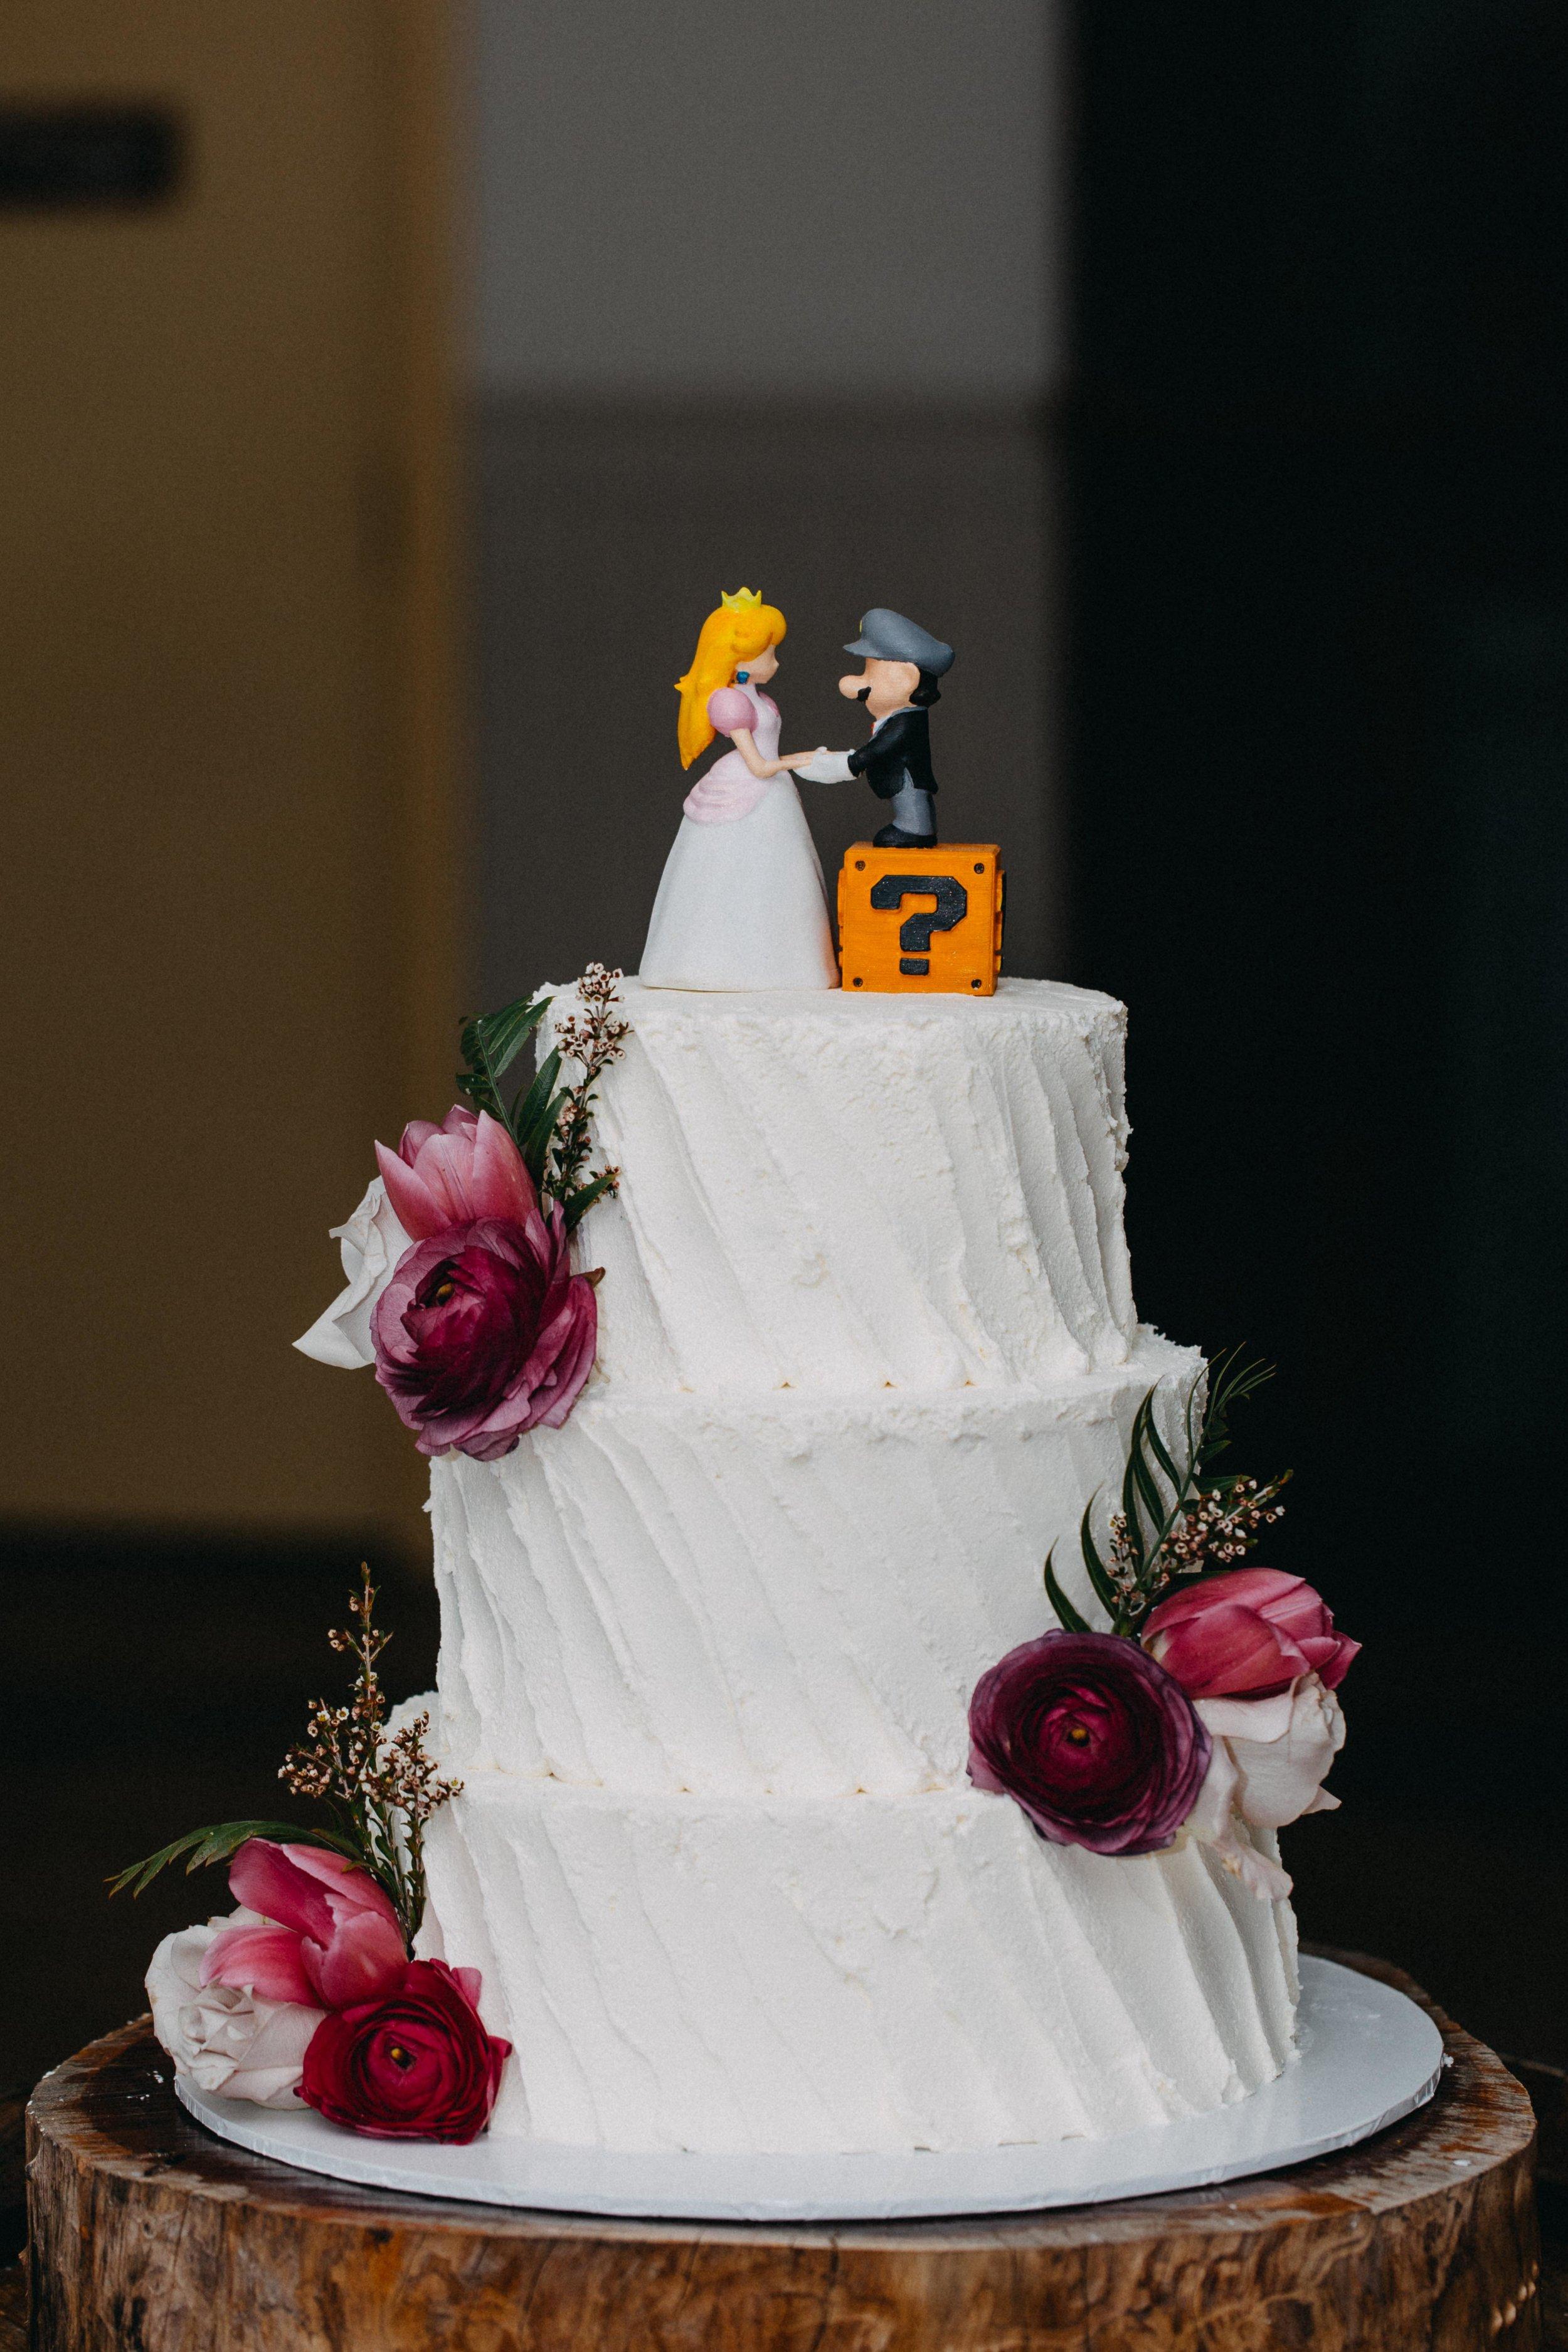 appin-house-wedding-macarthur-www.emilyobrienphotography.net-58.jpg